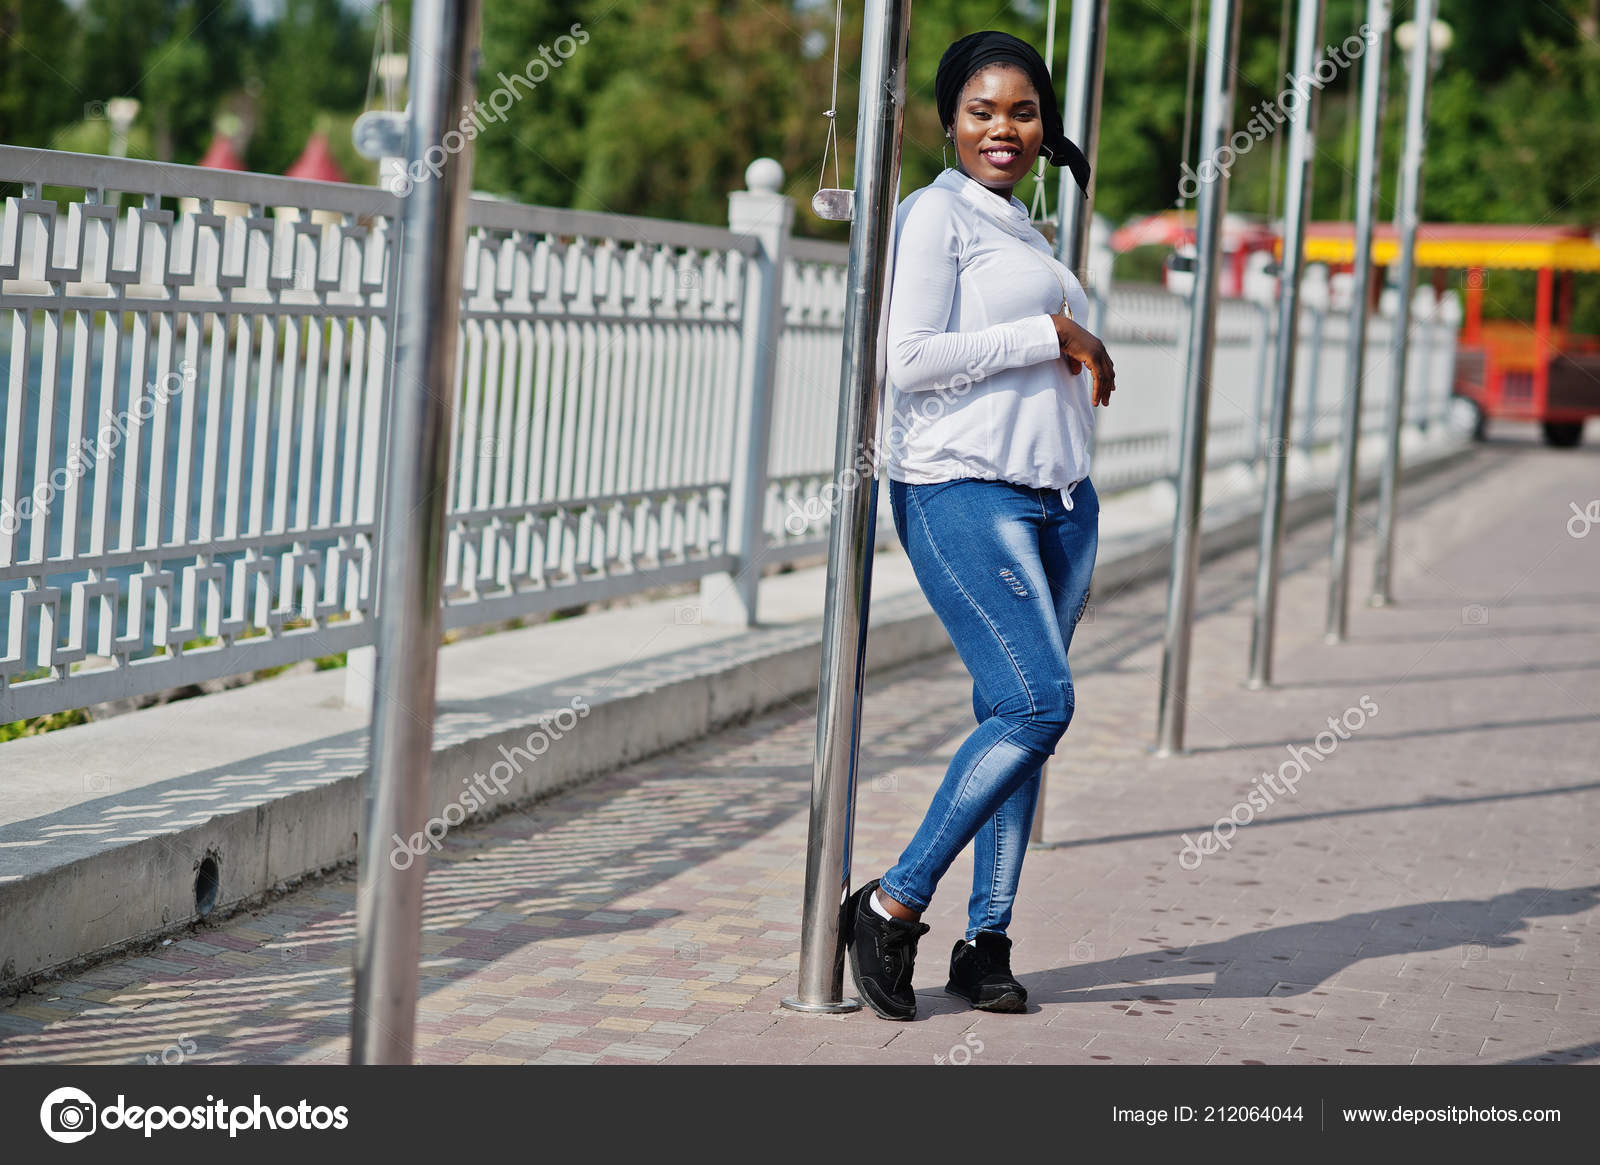 322b2ea49c African Muslim Girl Black Hijab White Sweatshirt Jeans Posed Outdoor — Stock  Photo